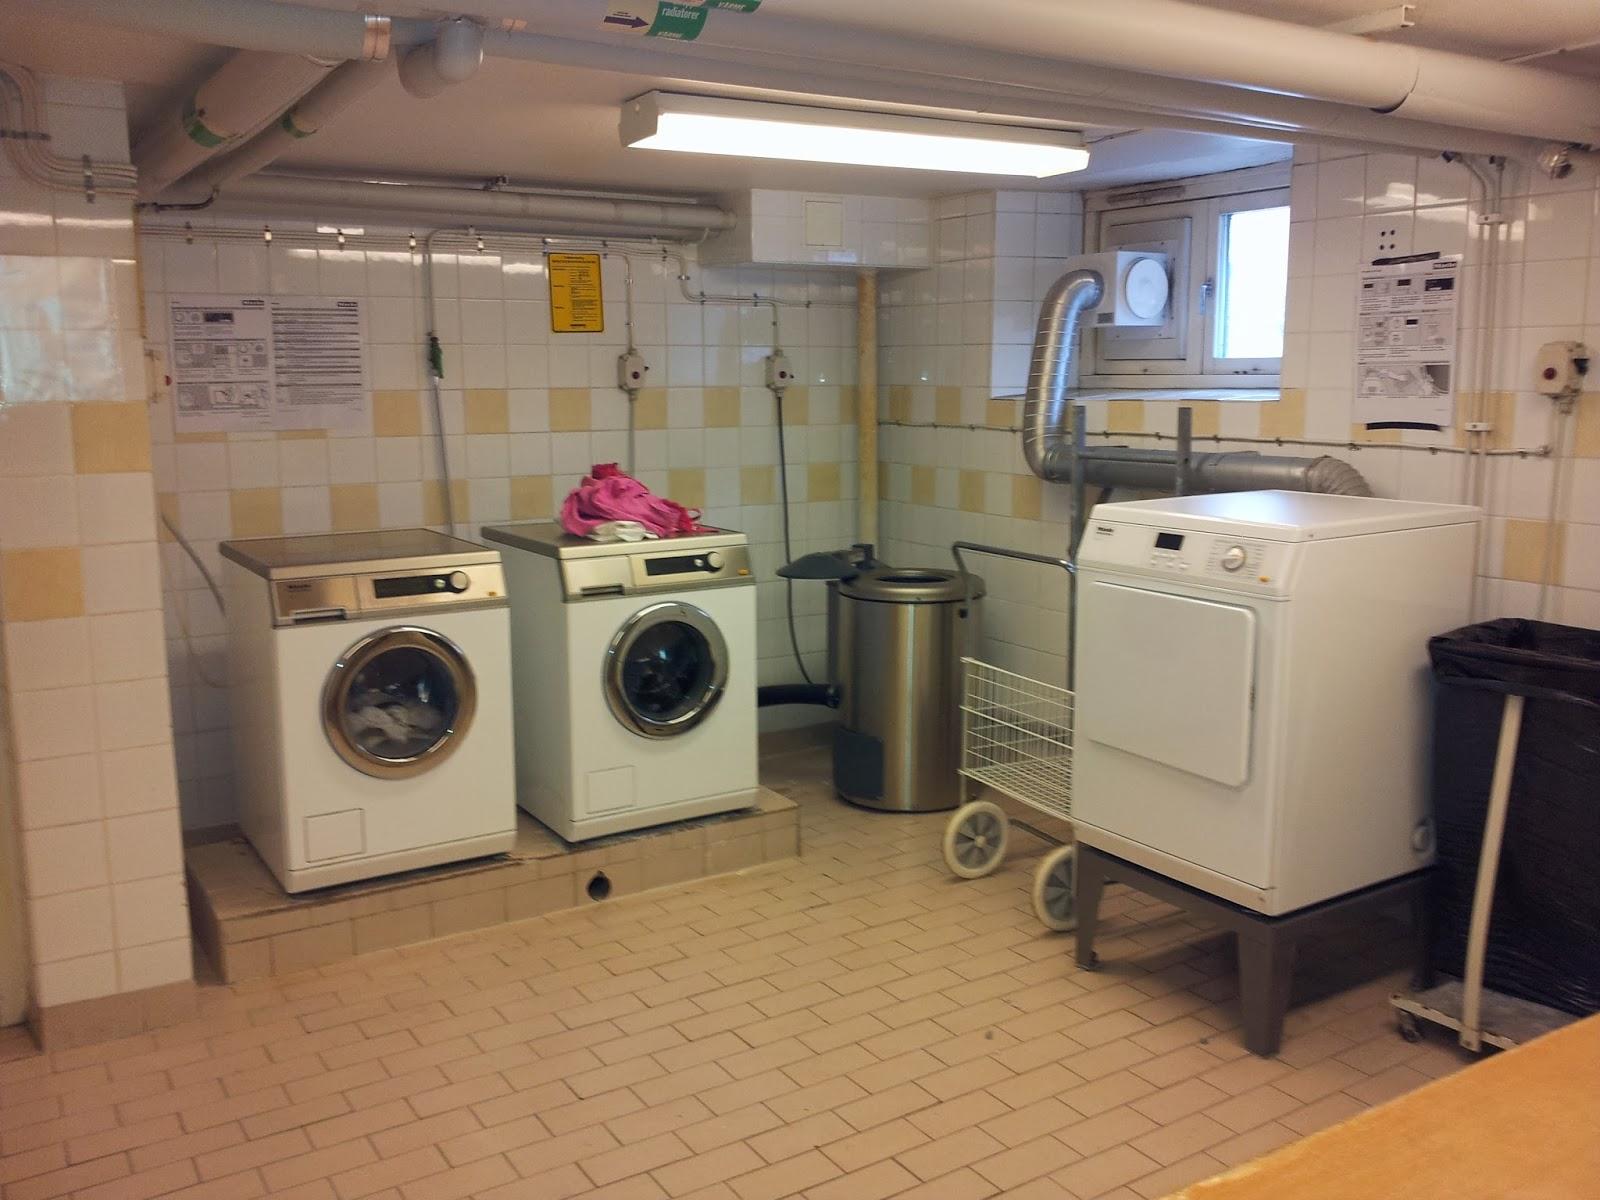 Armadio per lavanderia: casafacile l armadio a muro per nascondere ...